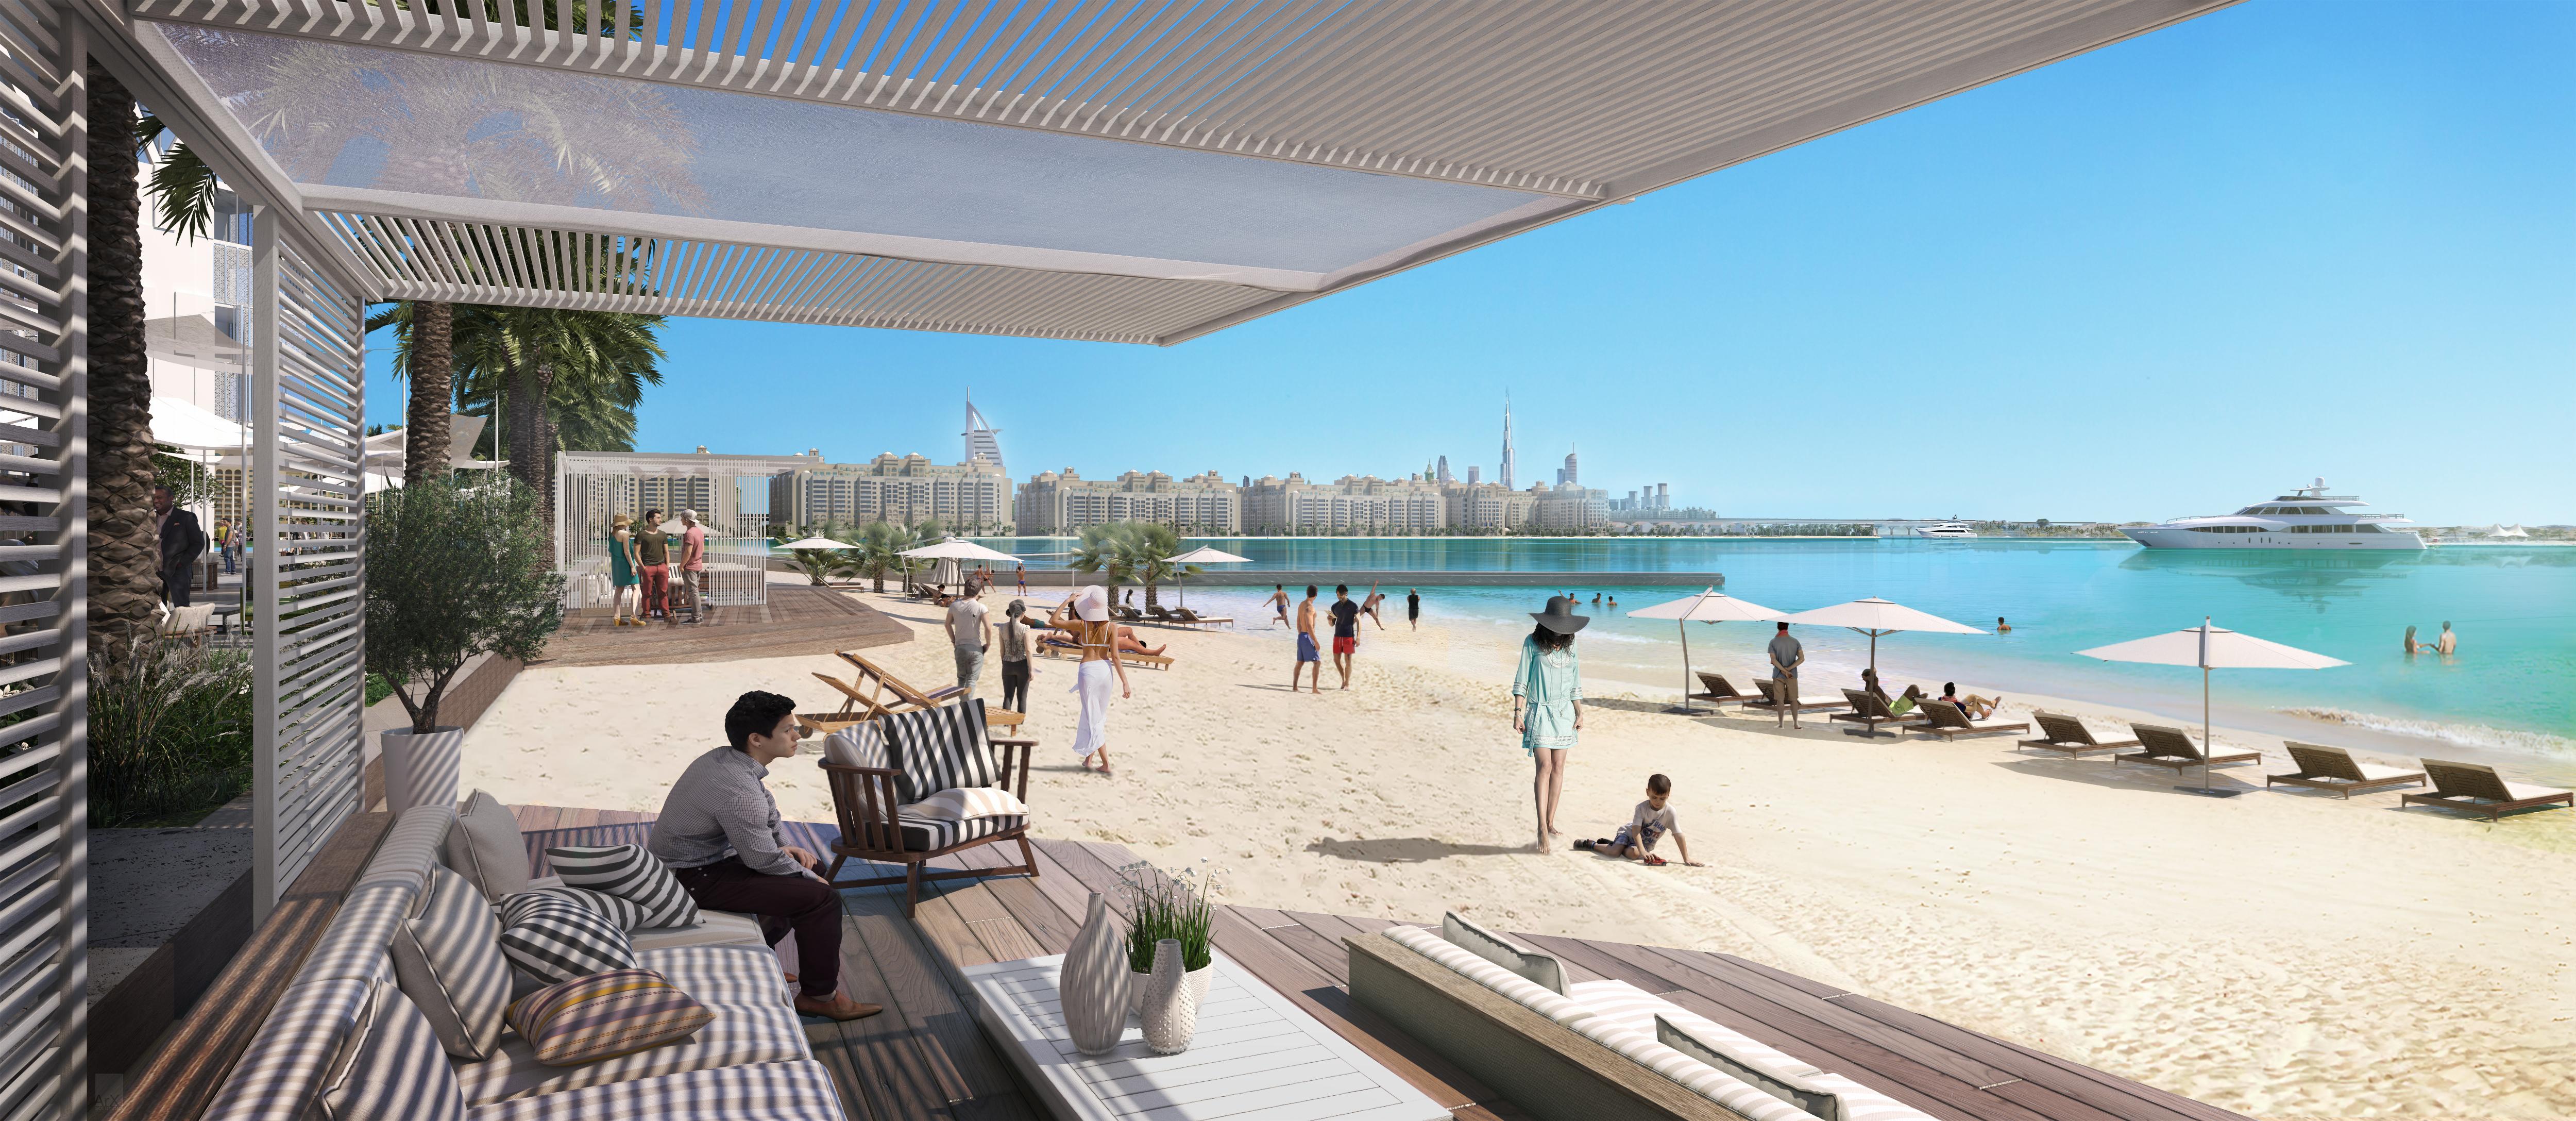 SQ8-DubaiHarbour-03-Beach02-02